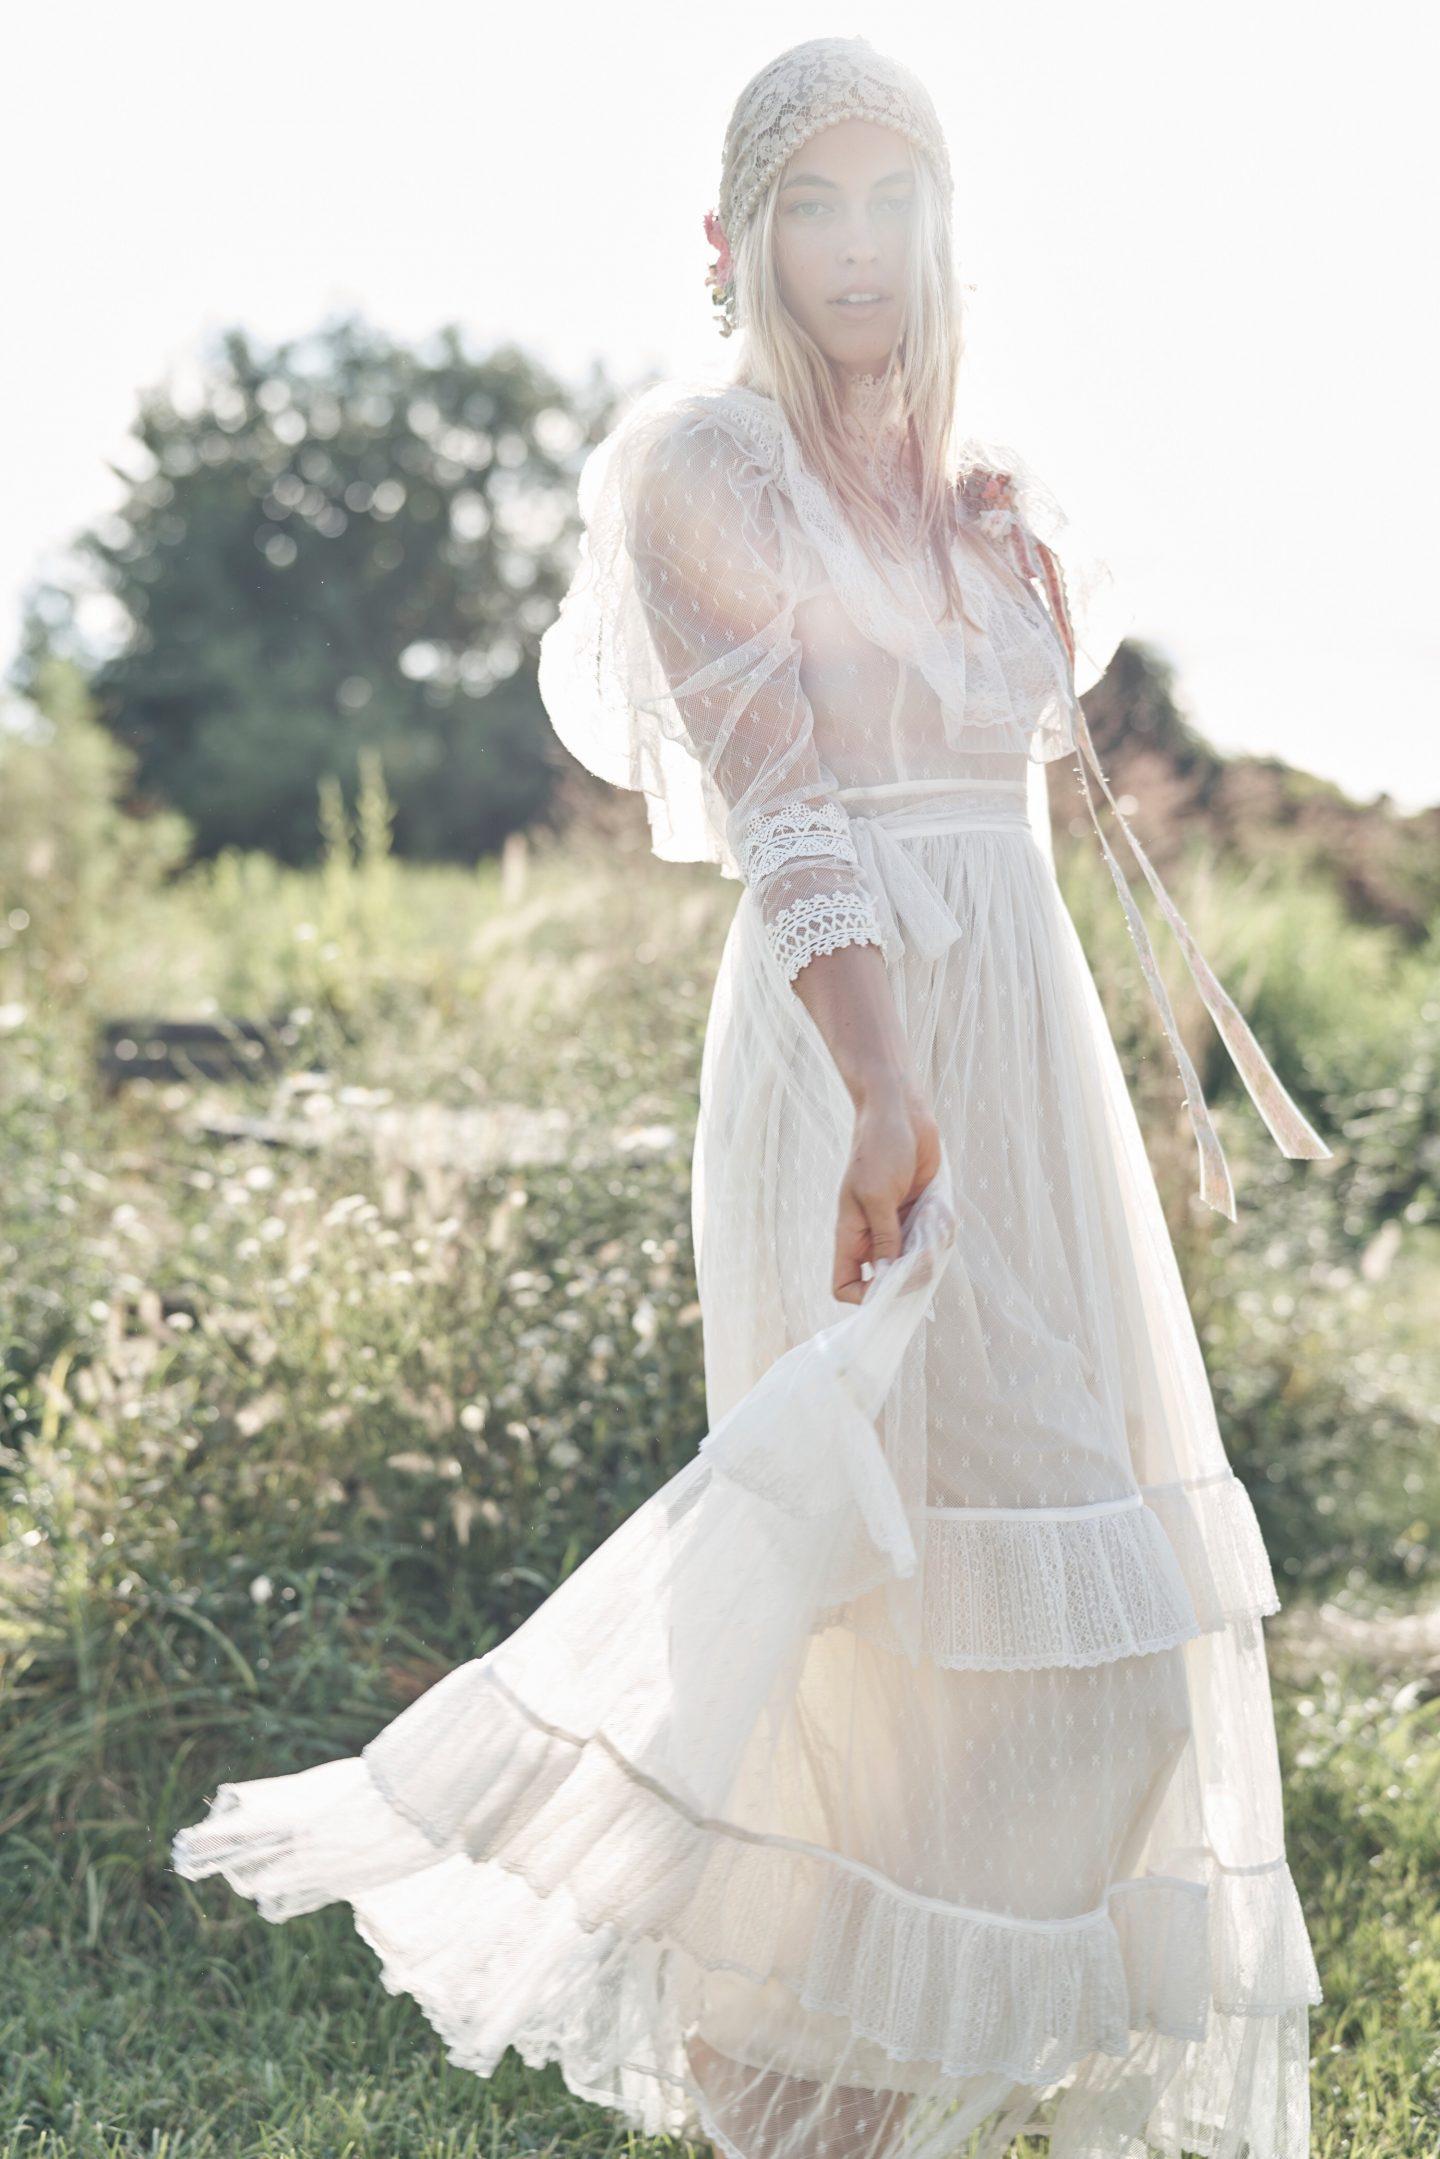 White cottagecore dresses